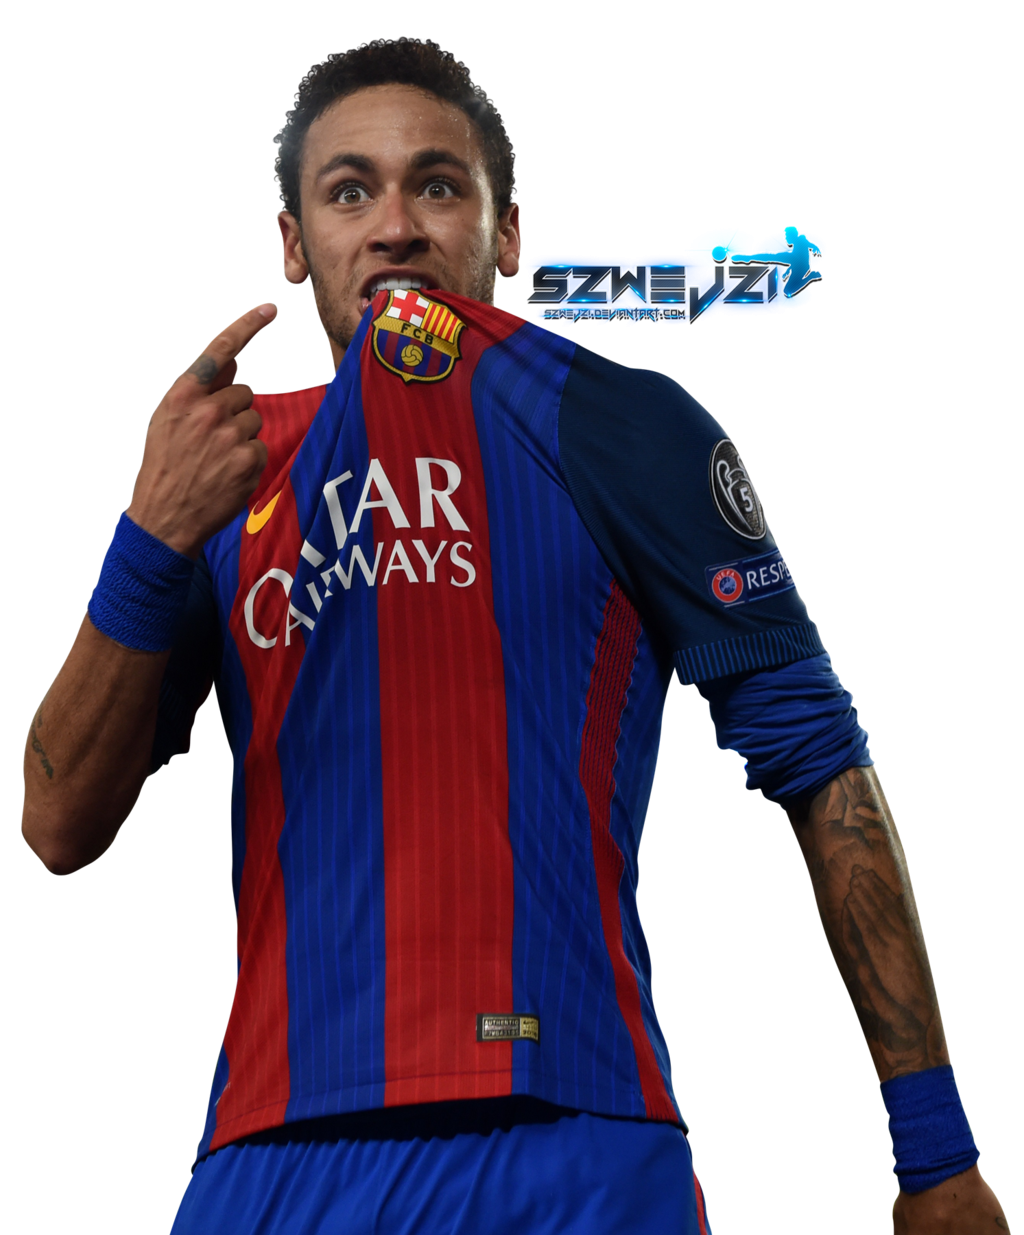 Neymar Png 2017 Funny Face Goal.